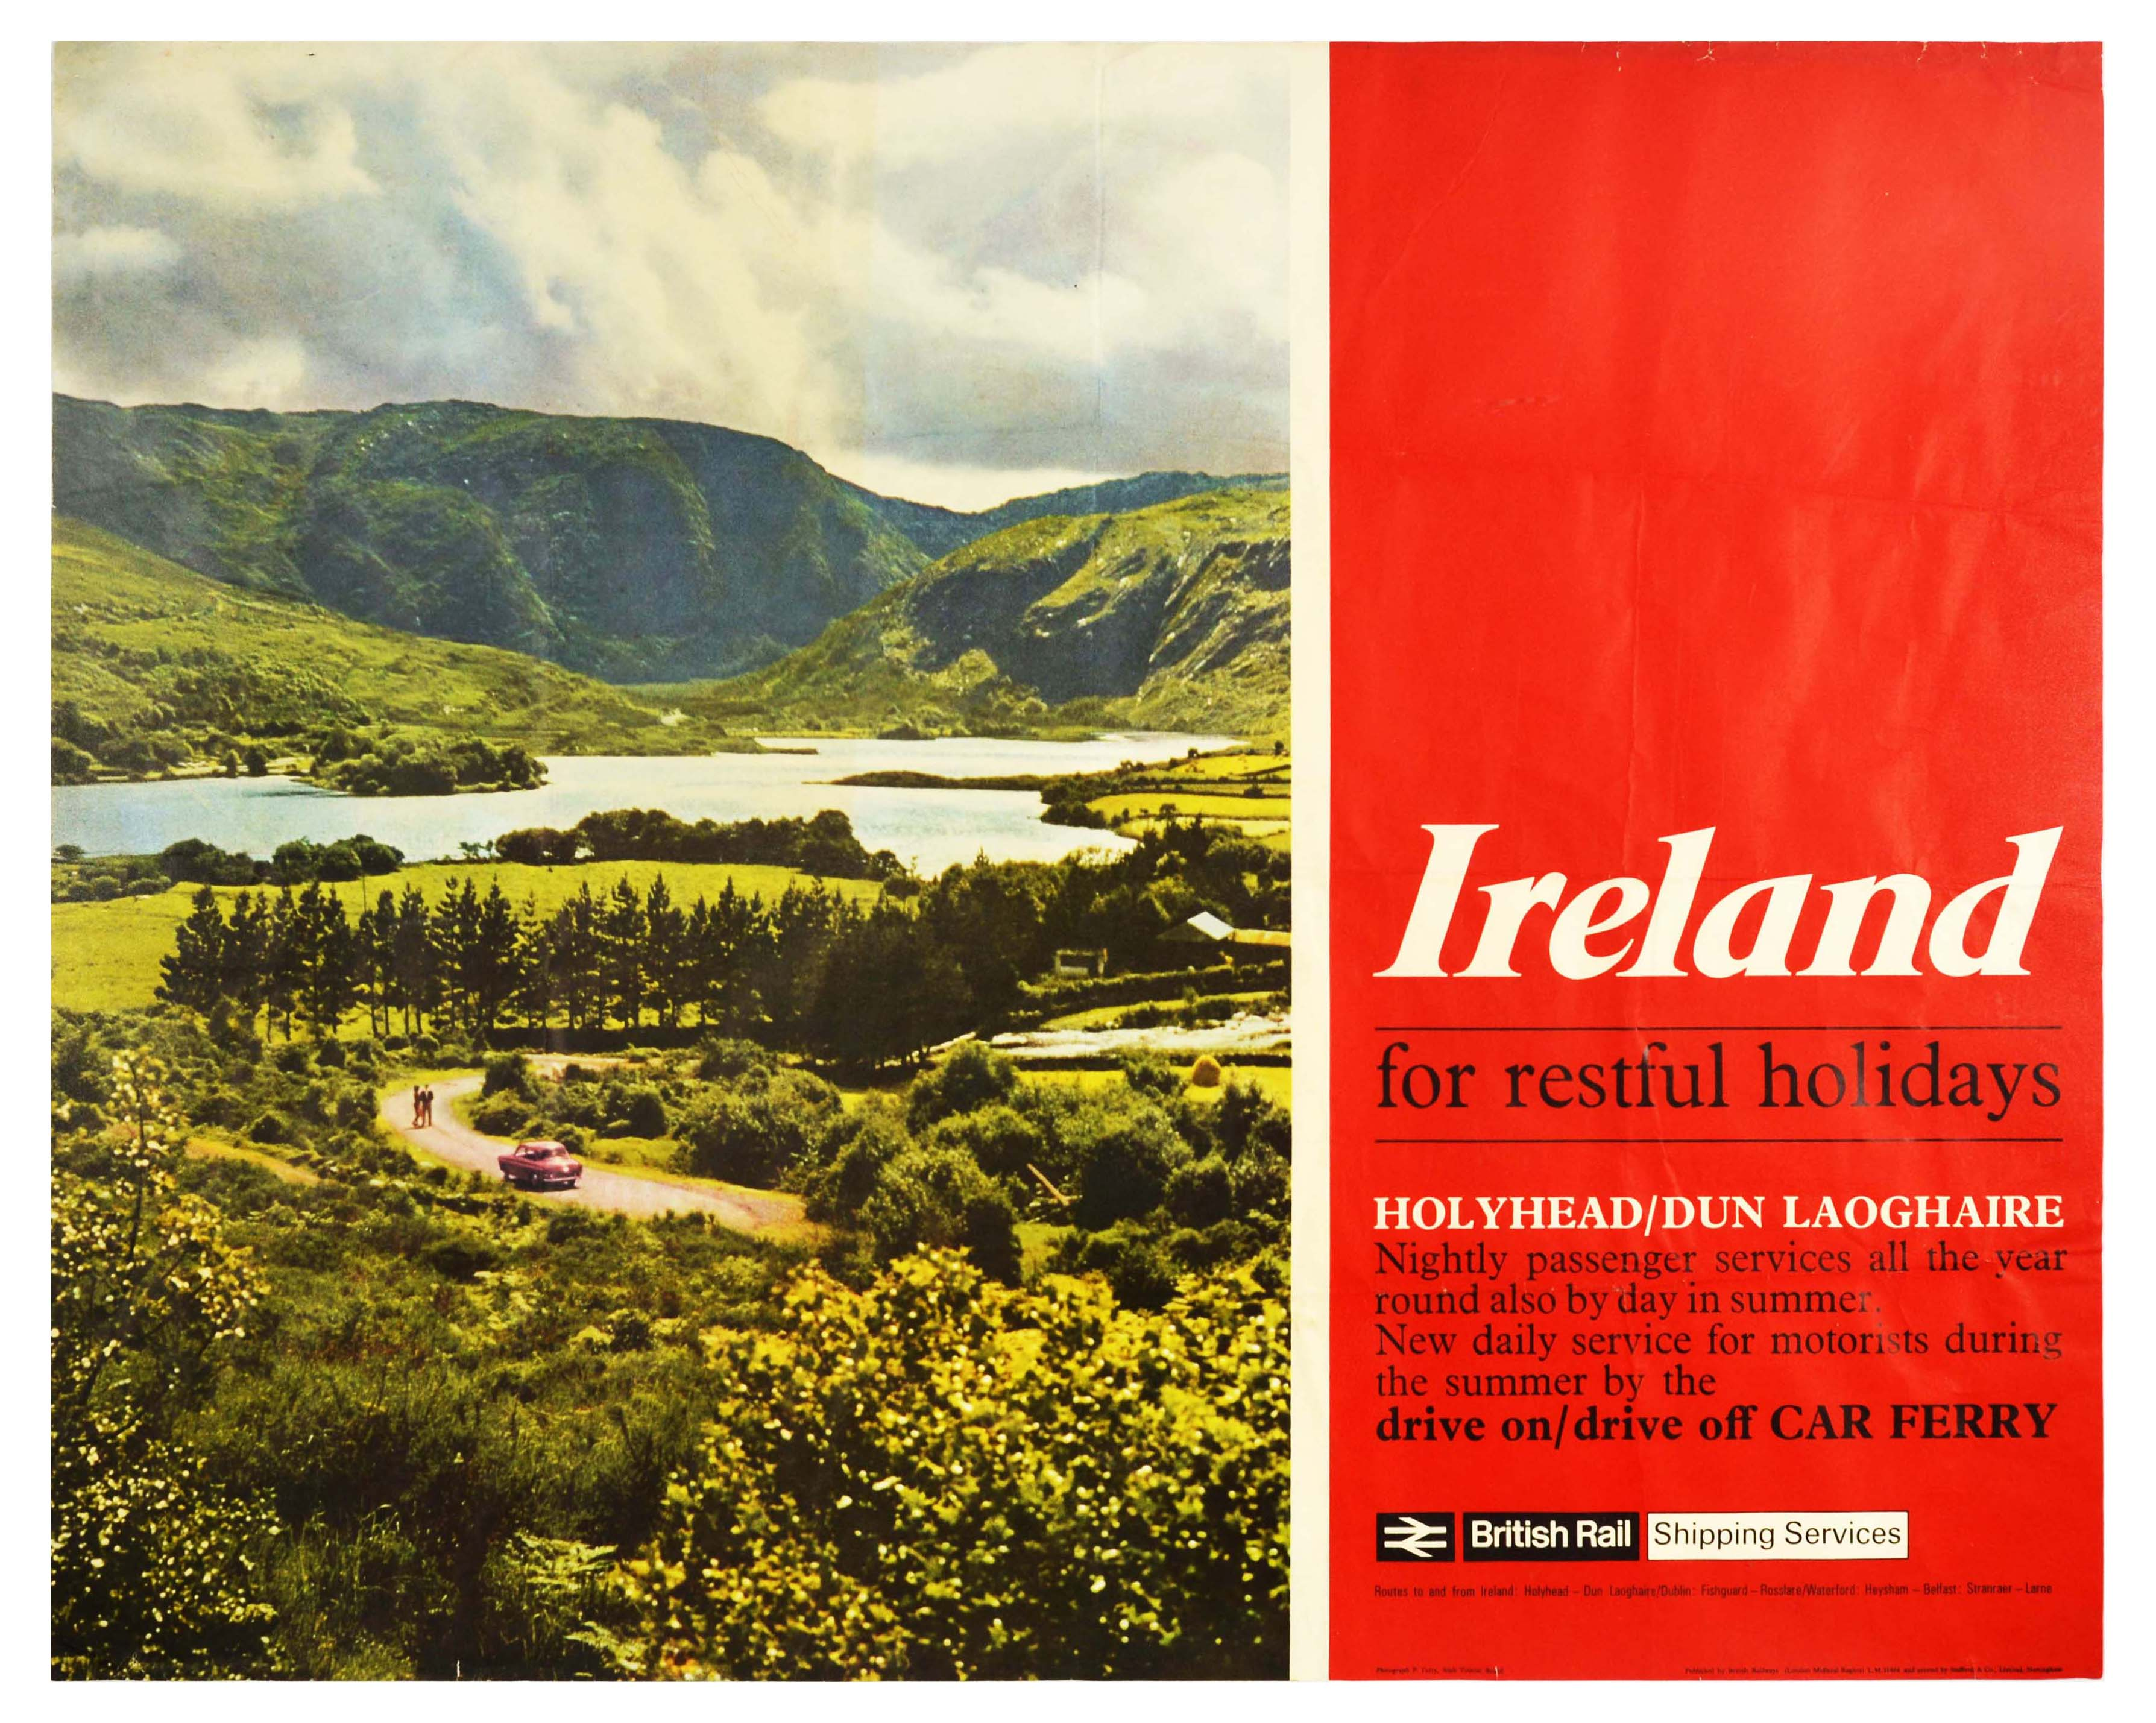 Travel Poster British Railways Ireland Holiday Holyhead Dun Laoghaire